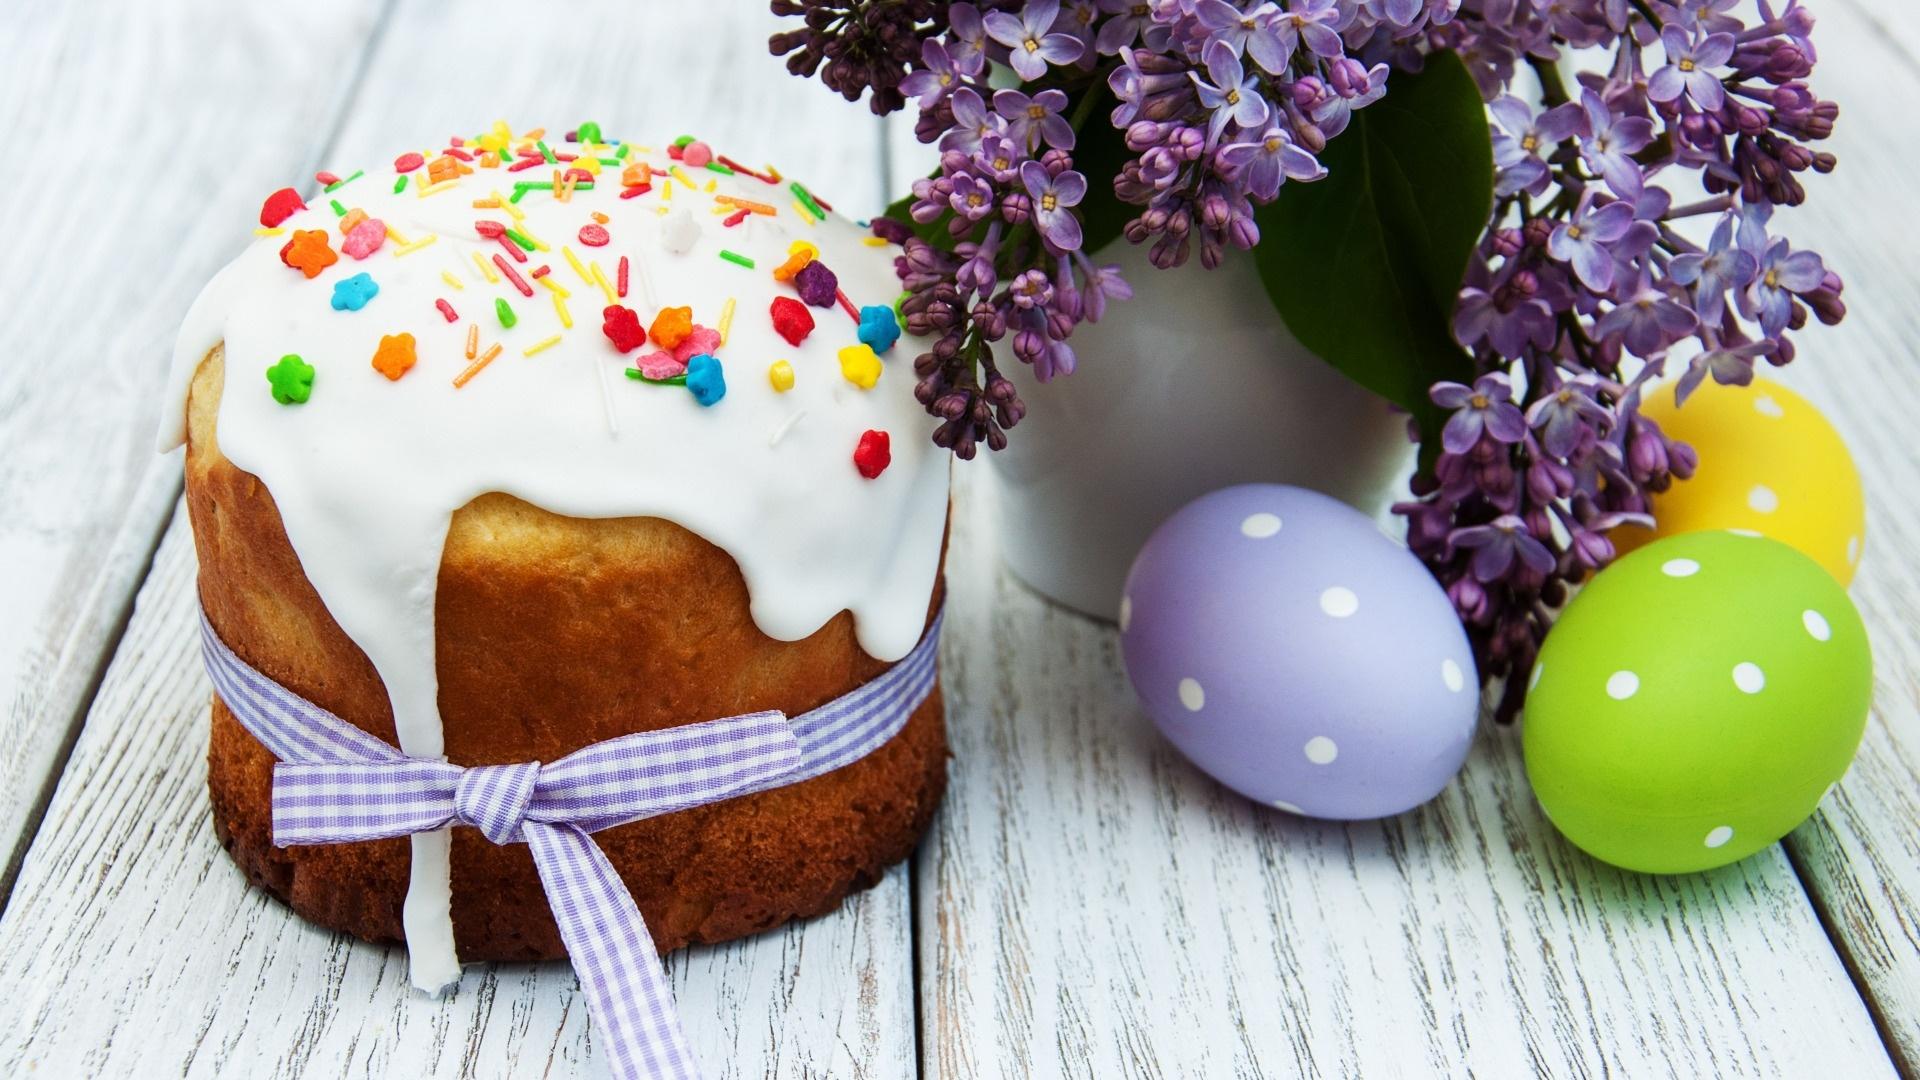 Easter Cake wallpaper for computer